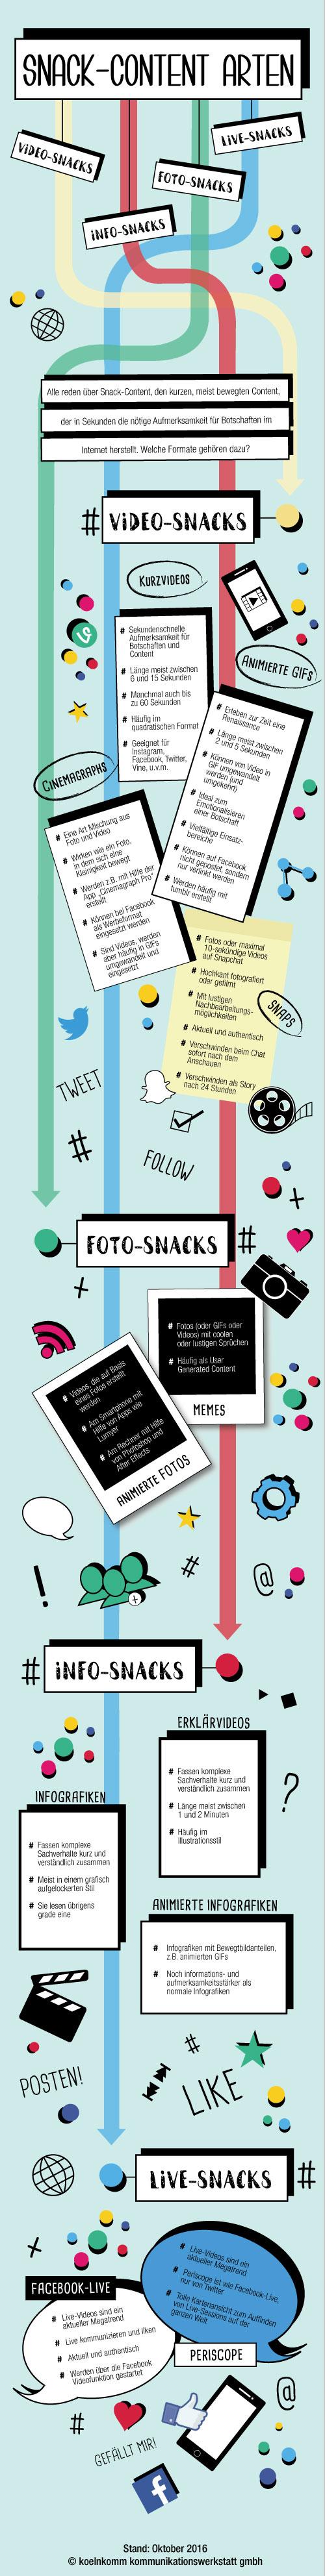 infografik_snack-content_web_500px_breit